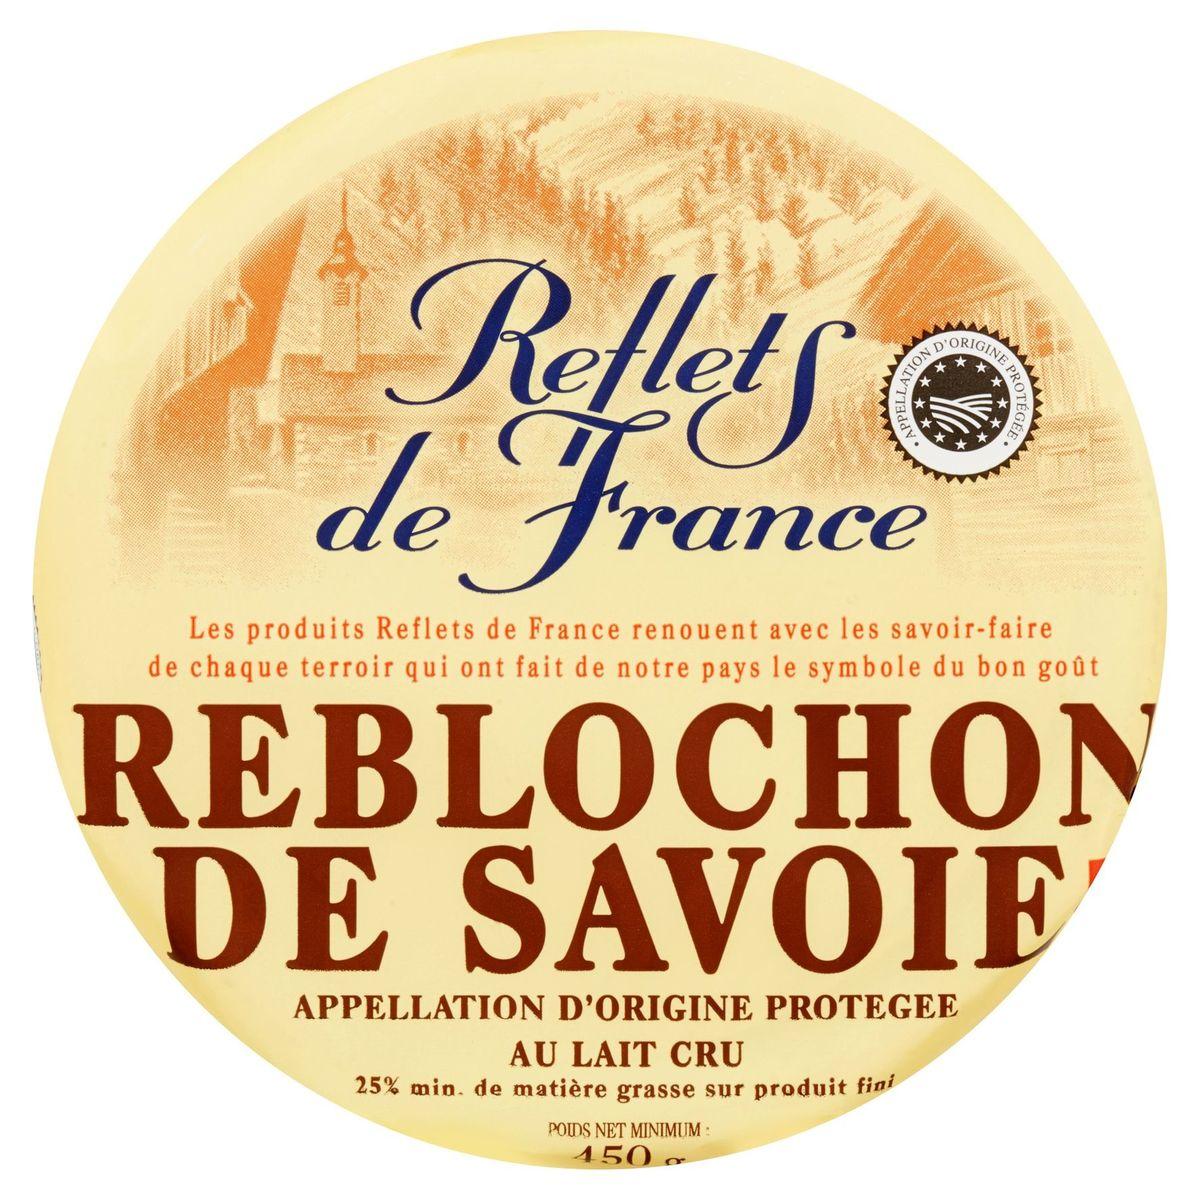 Reflets de France Reblochon de Savoie A.O.P. 450 g